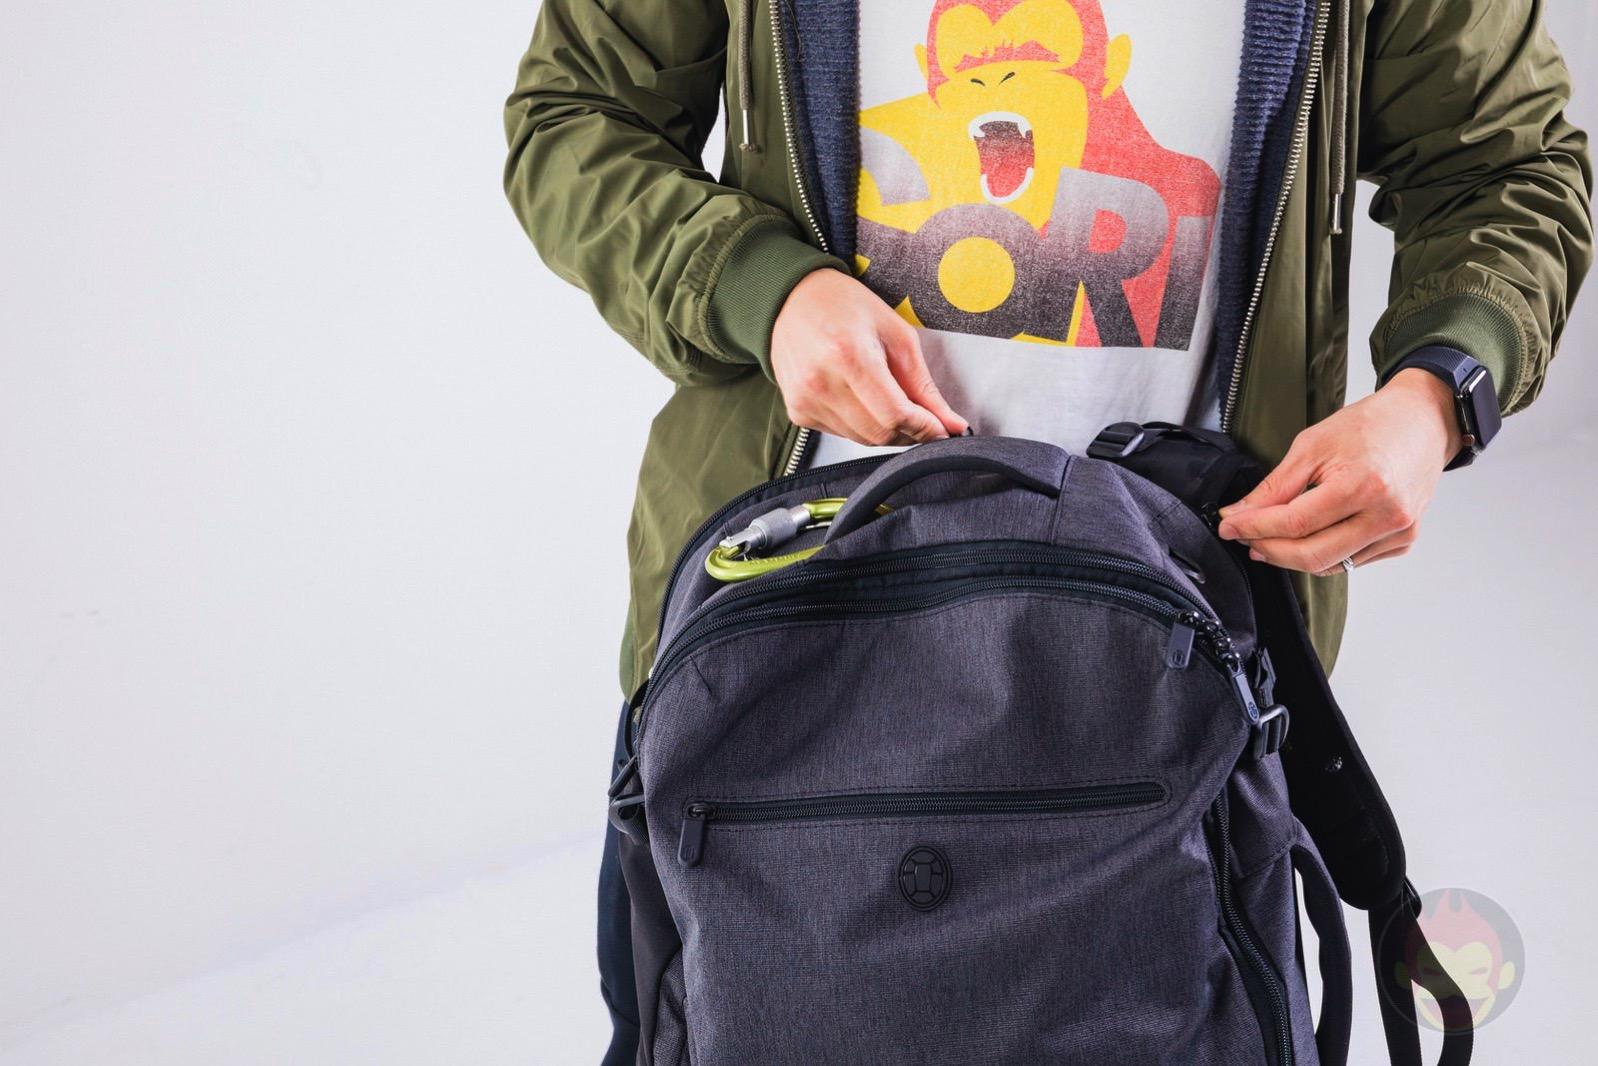 Tortuga-Setout-Backpack-35liter-review-31.jpg